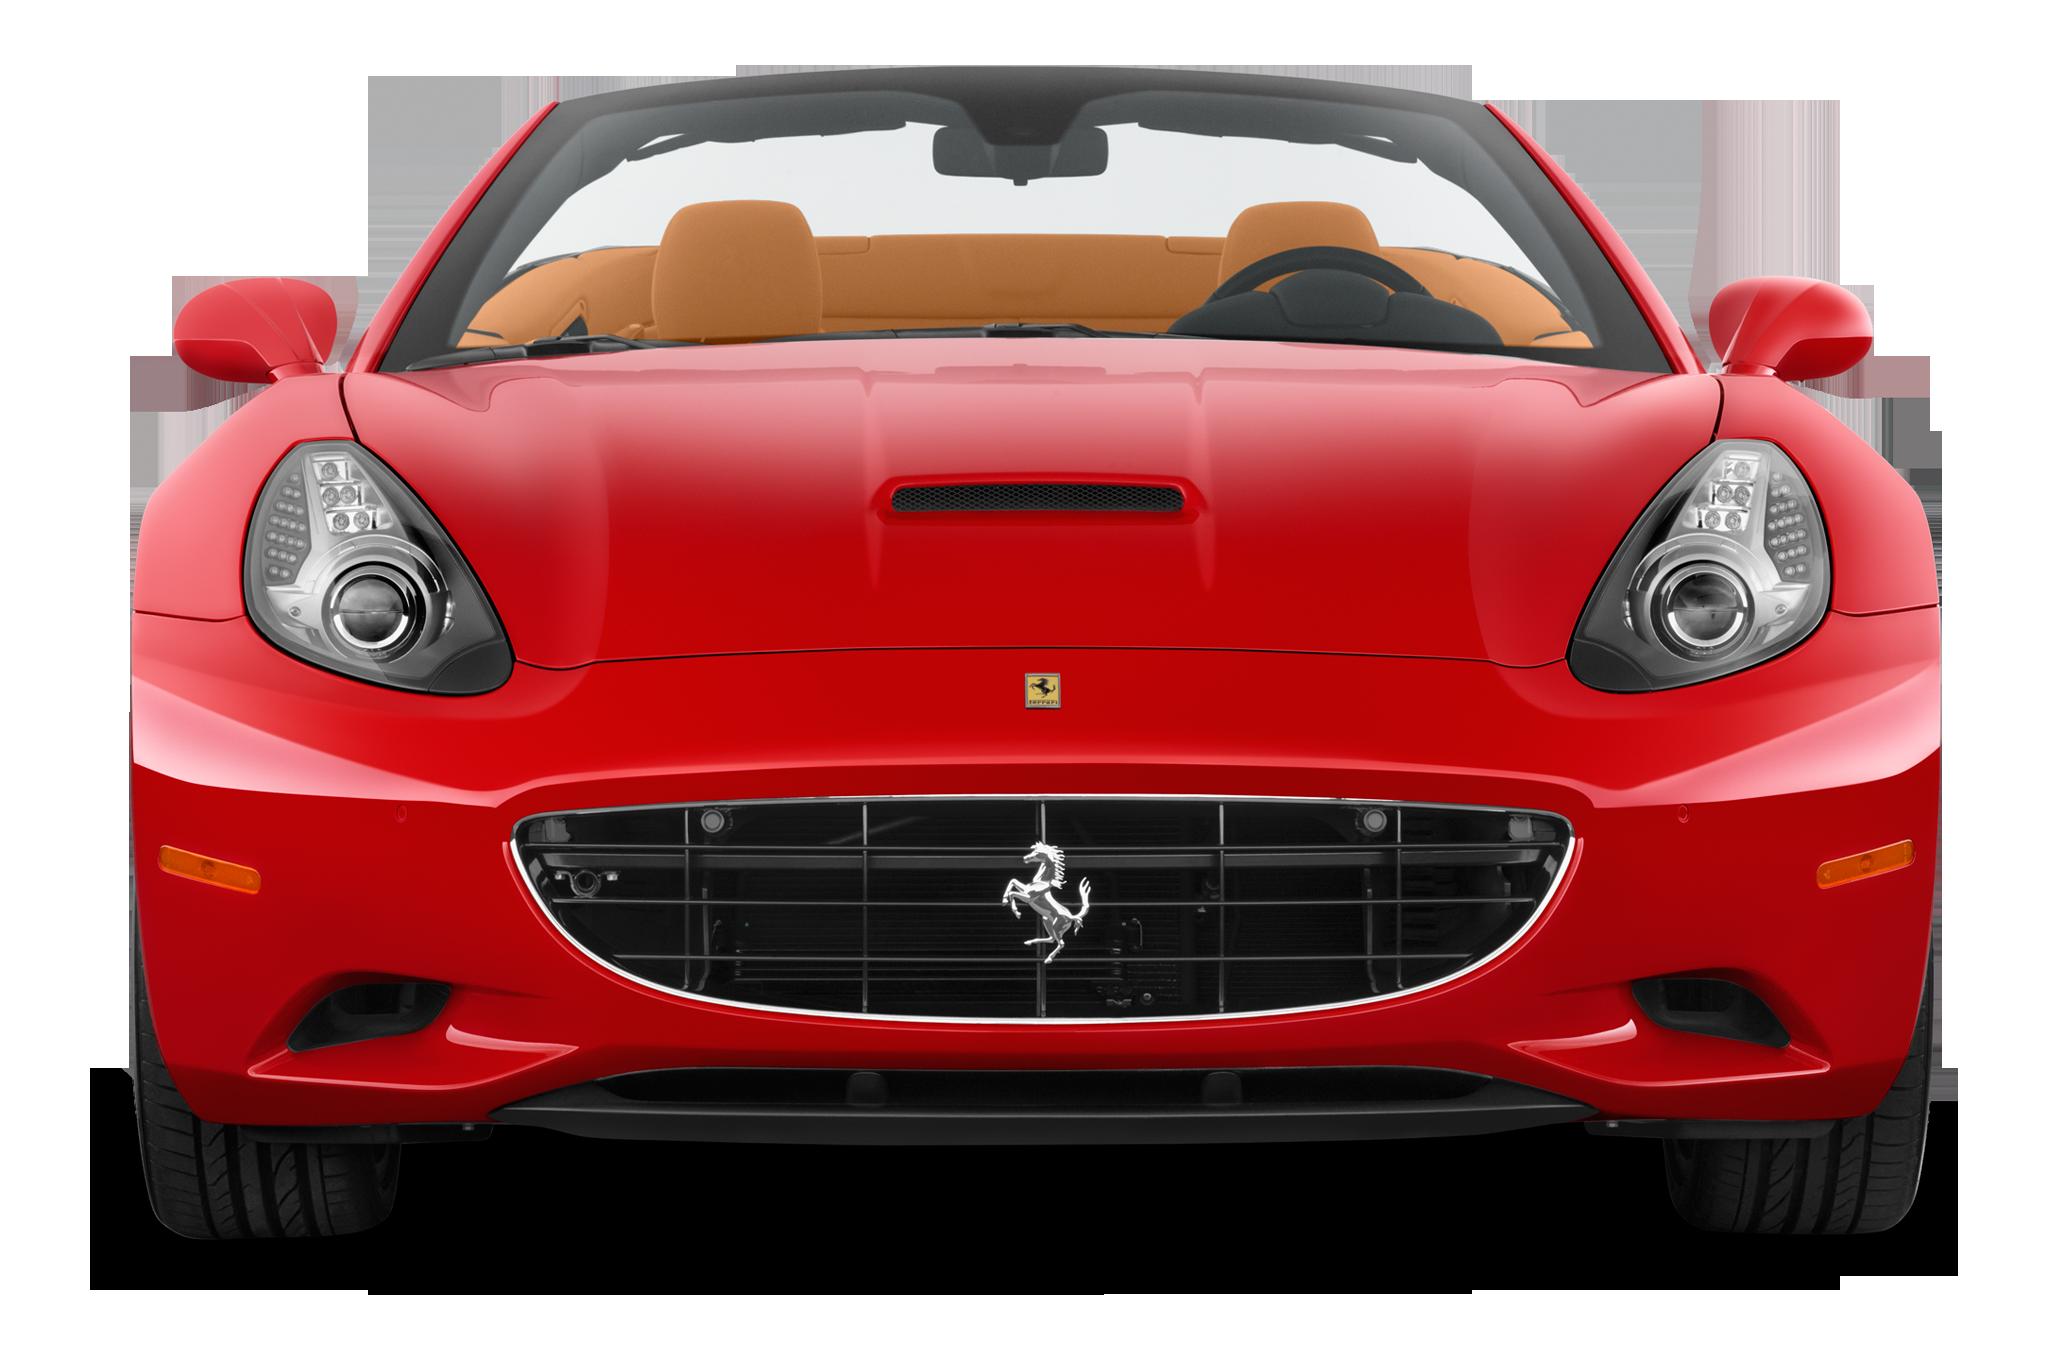 Ferarri clipart convertible Clipart image Car Download Clipart